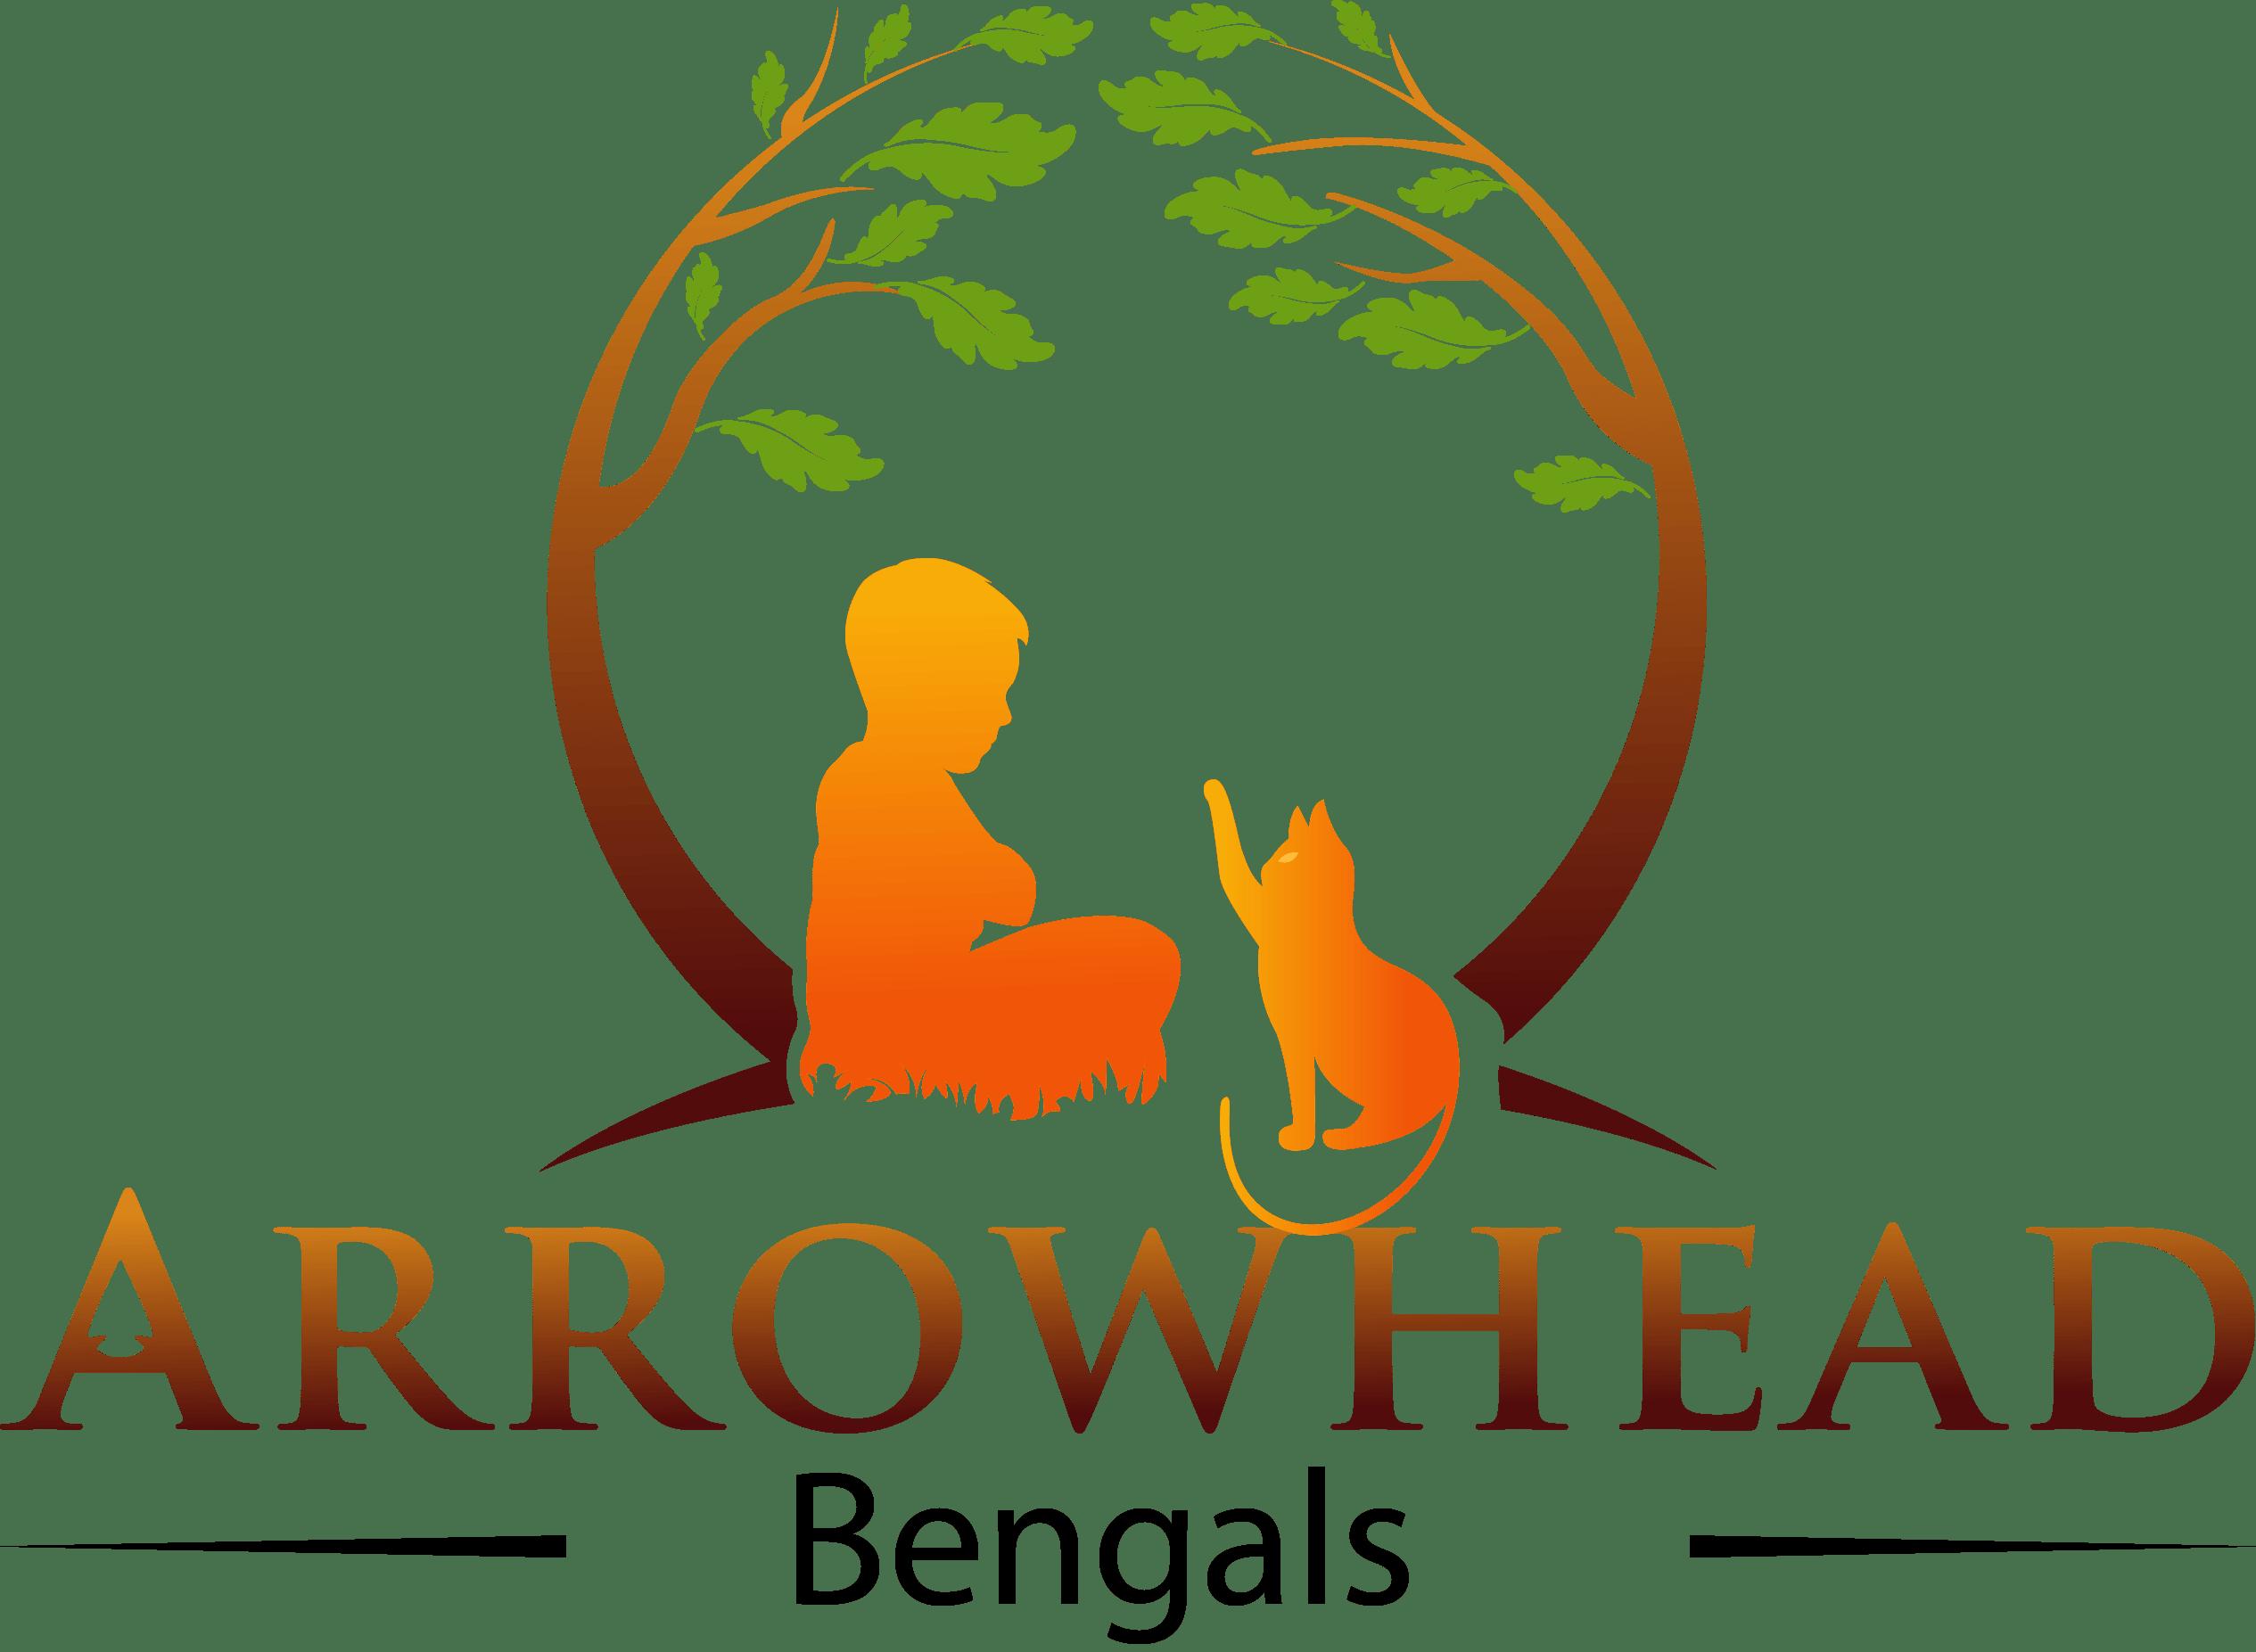 Arrowhead Bengals